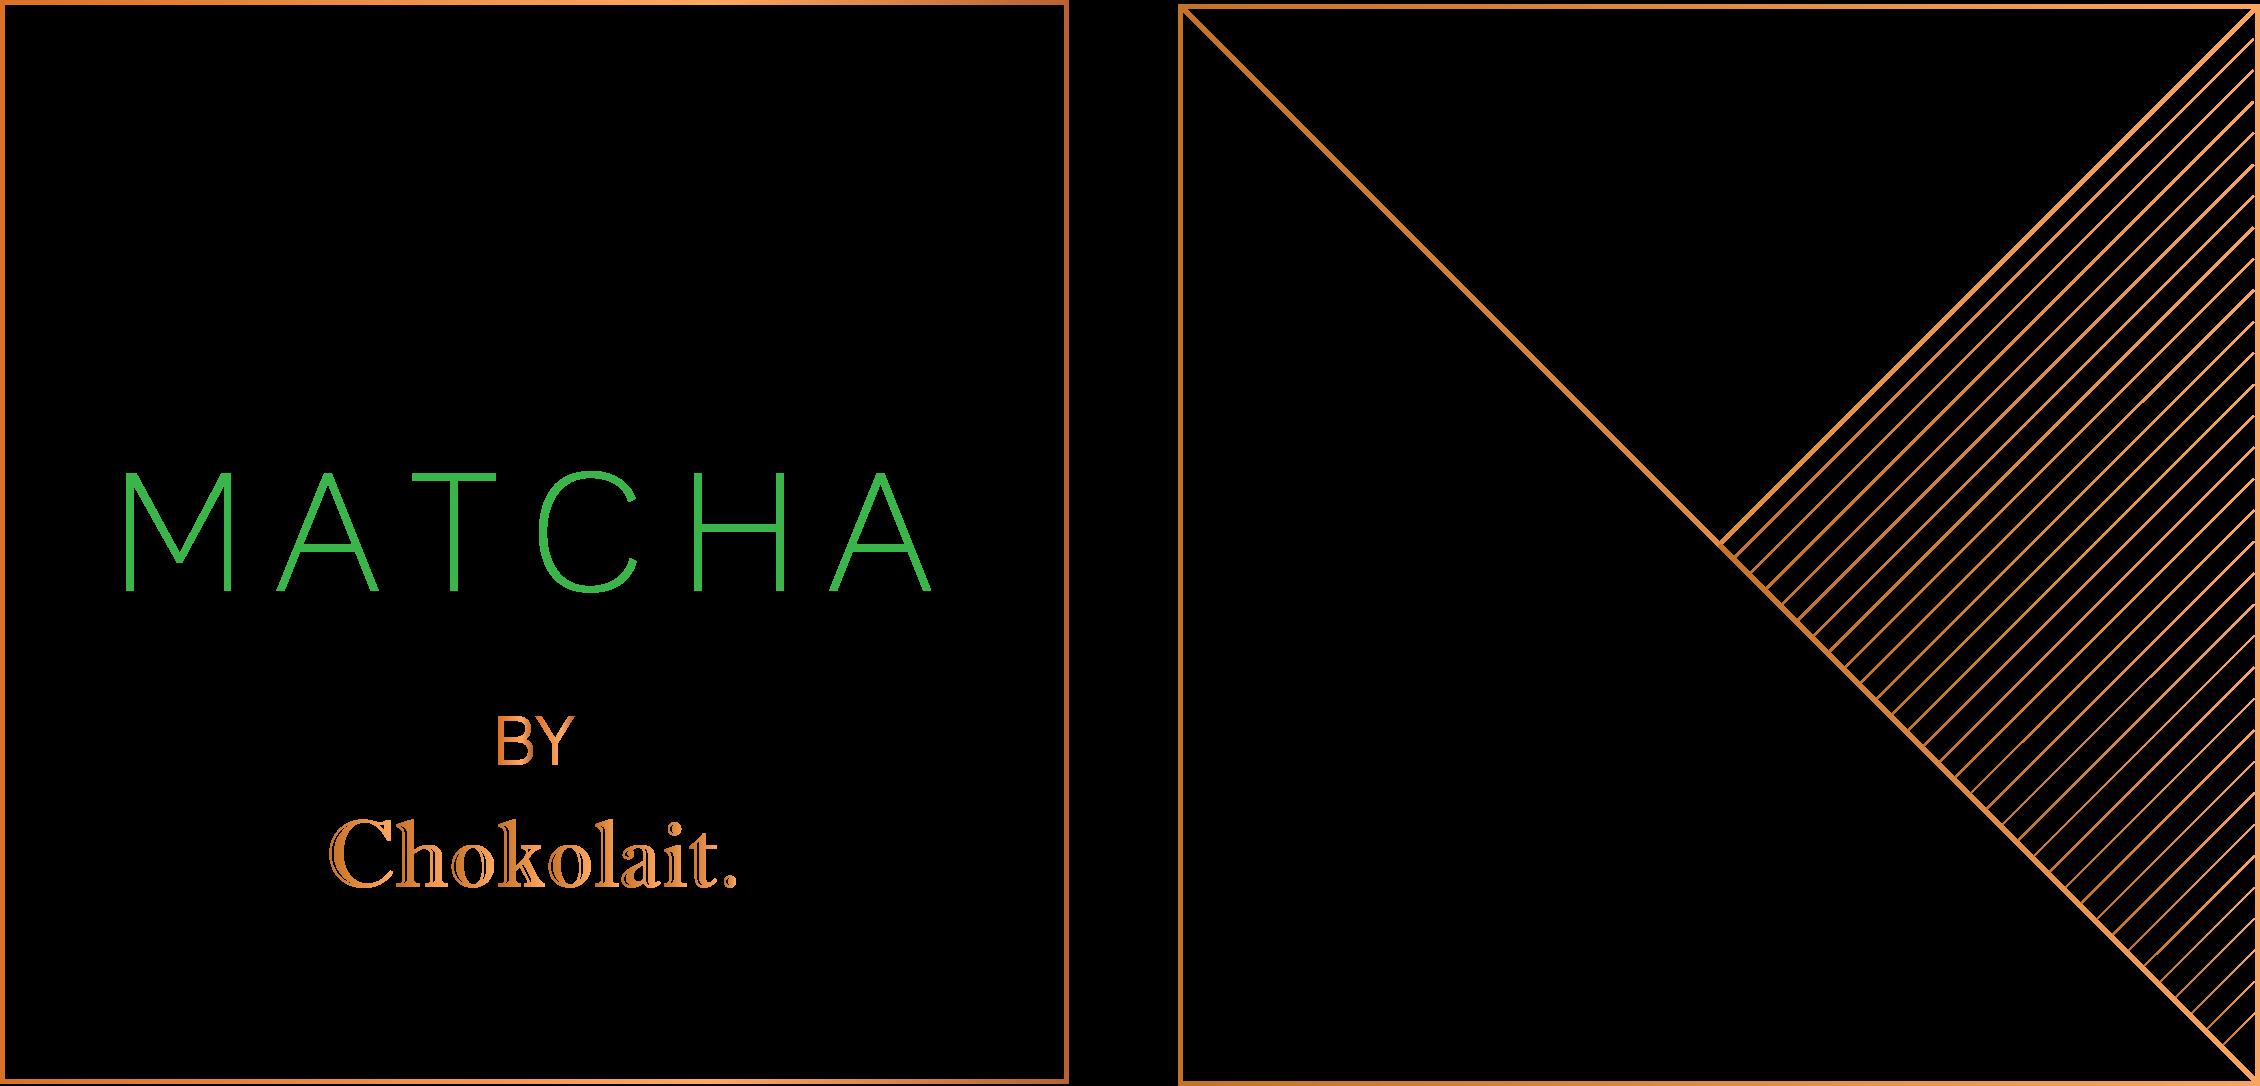 MatchaChokolaitLogo1.png